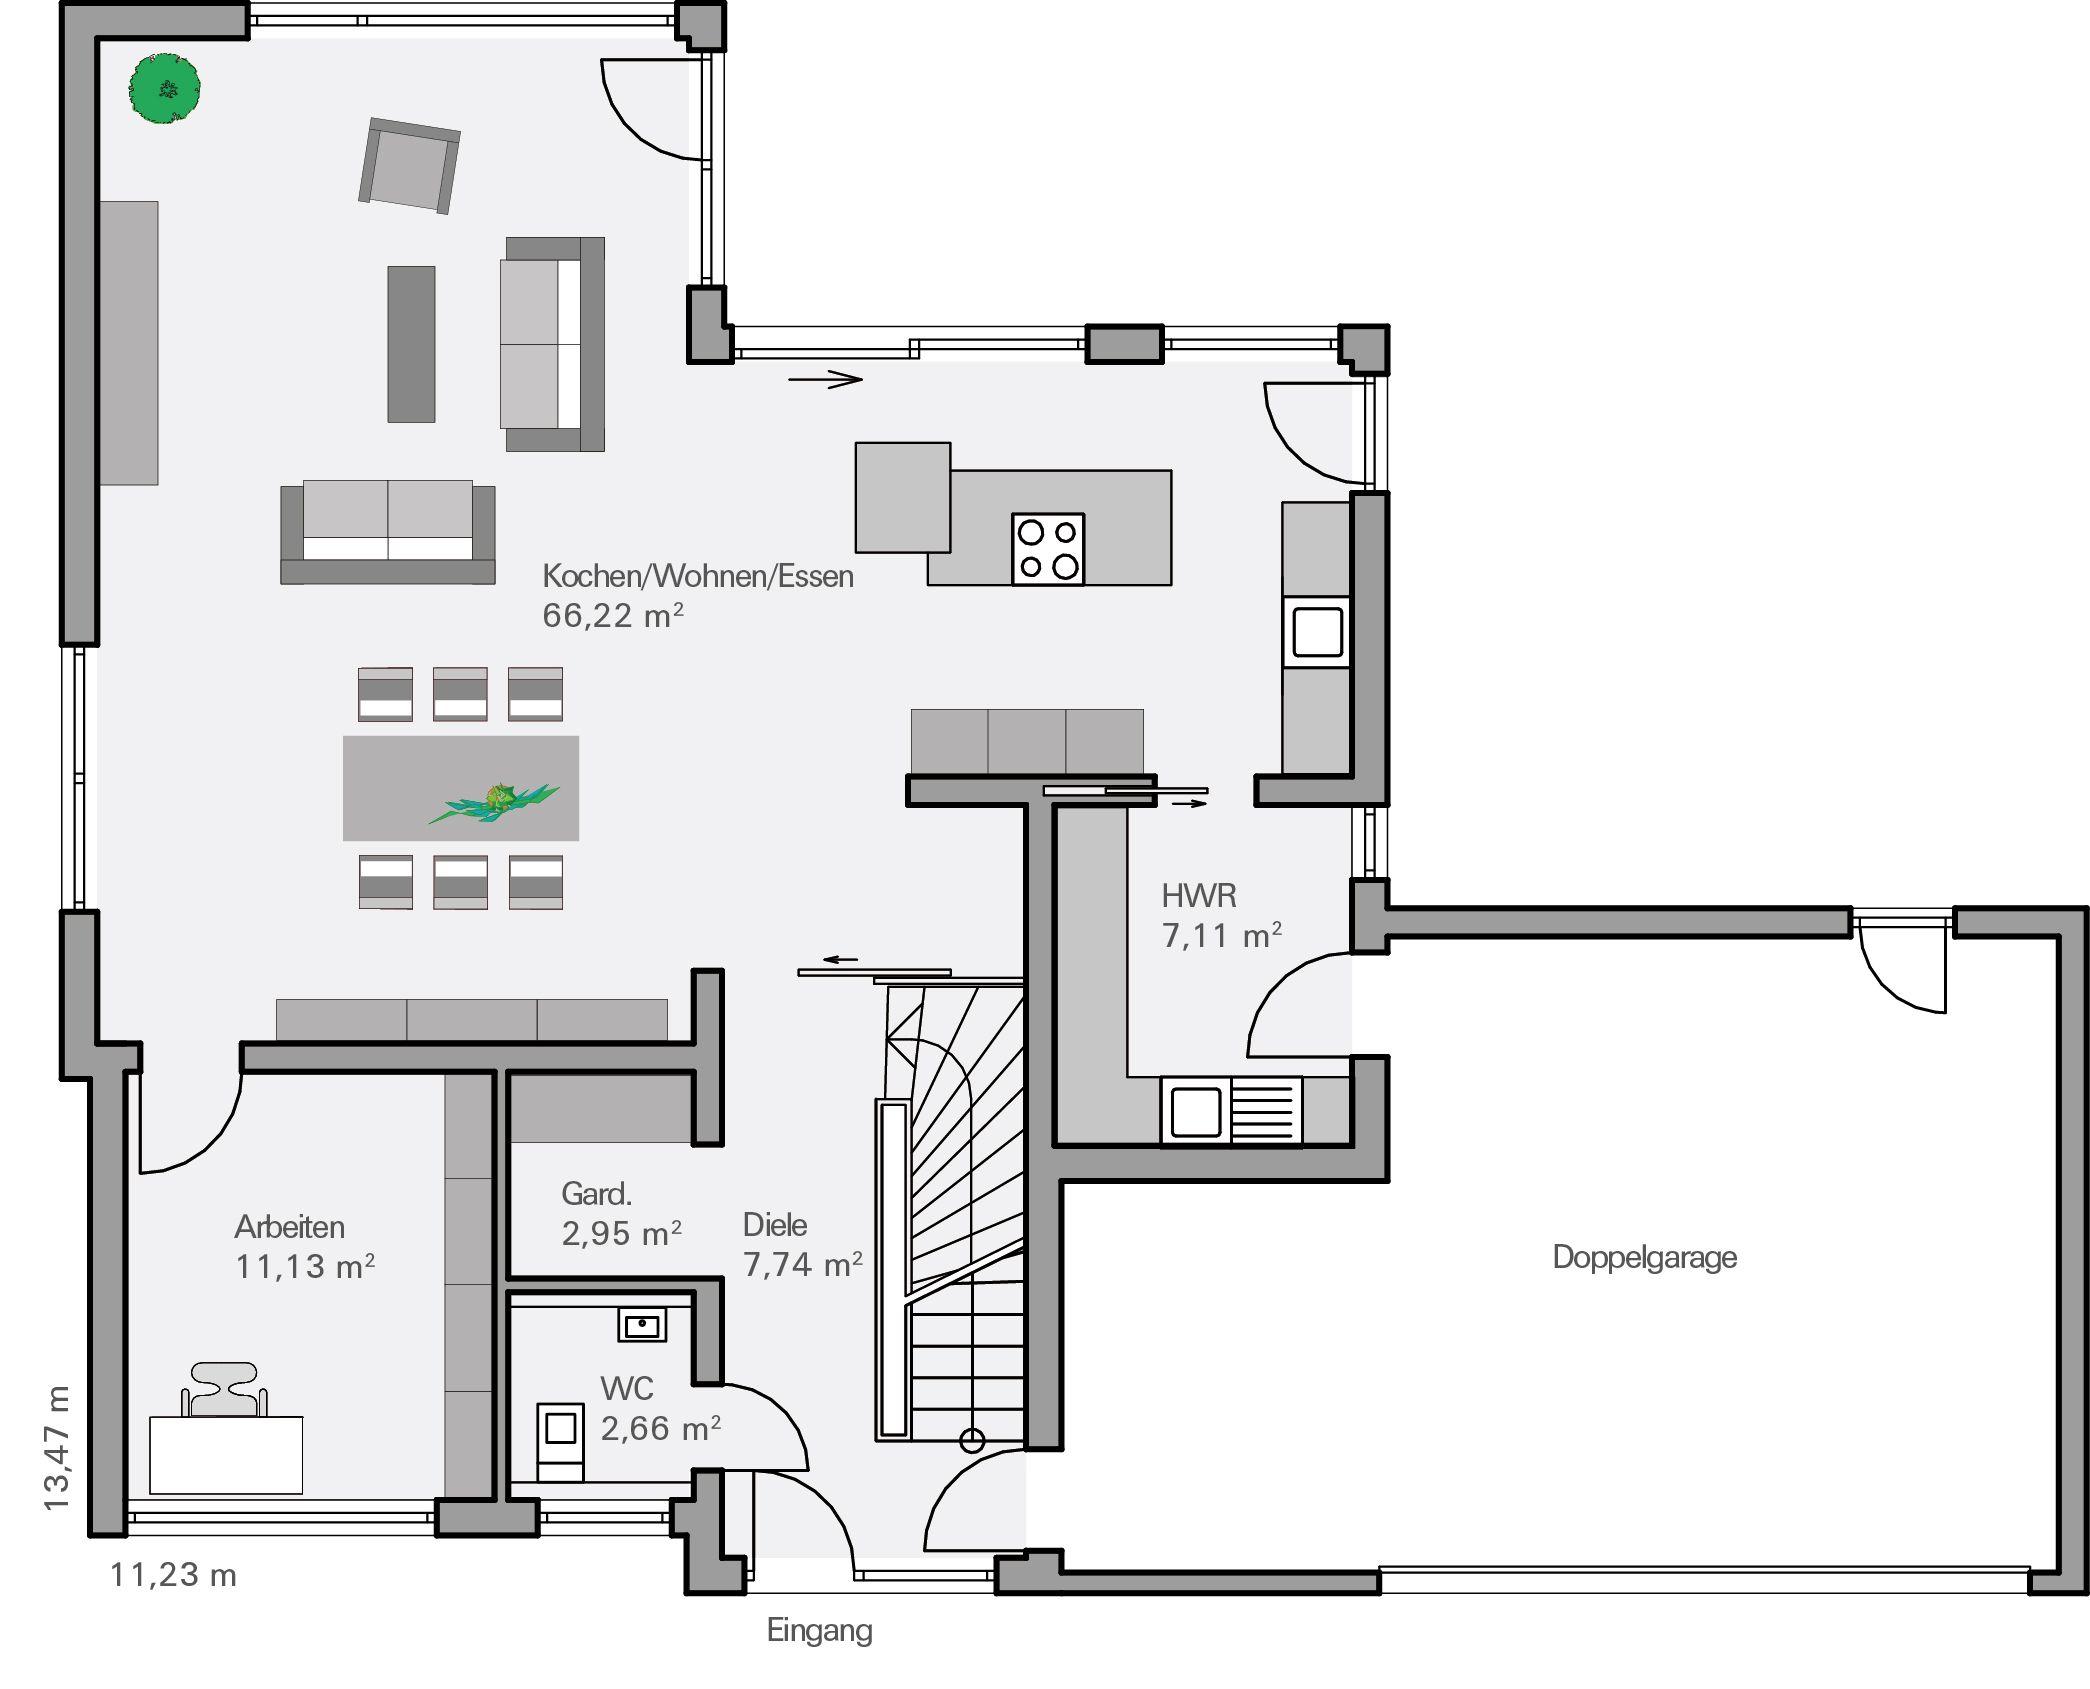 Haus schoenborn grundriss eg bemasst for Raumaufteilung einfamilienhaus neubau